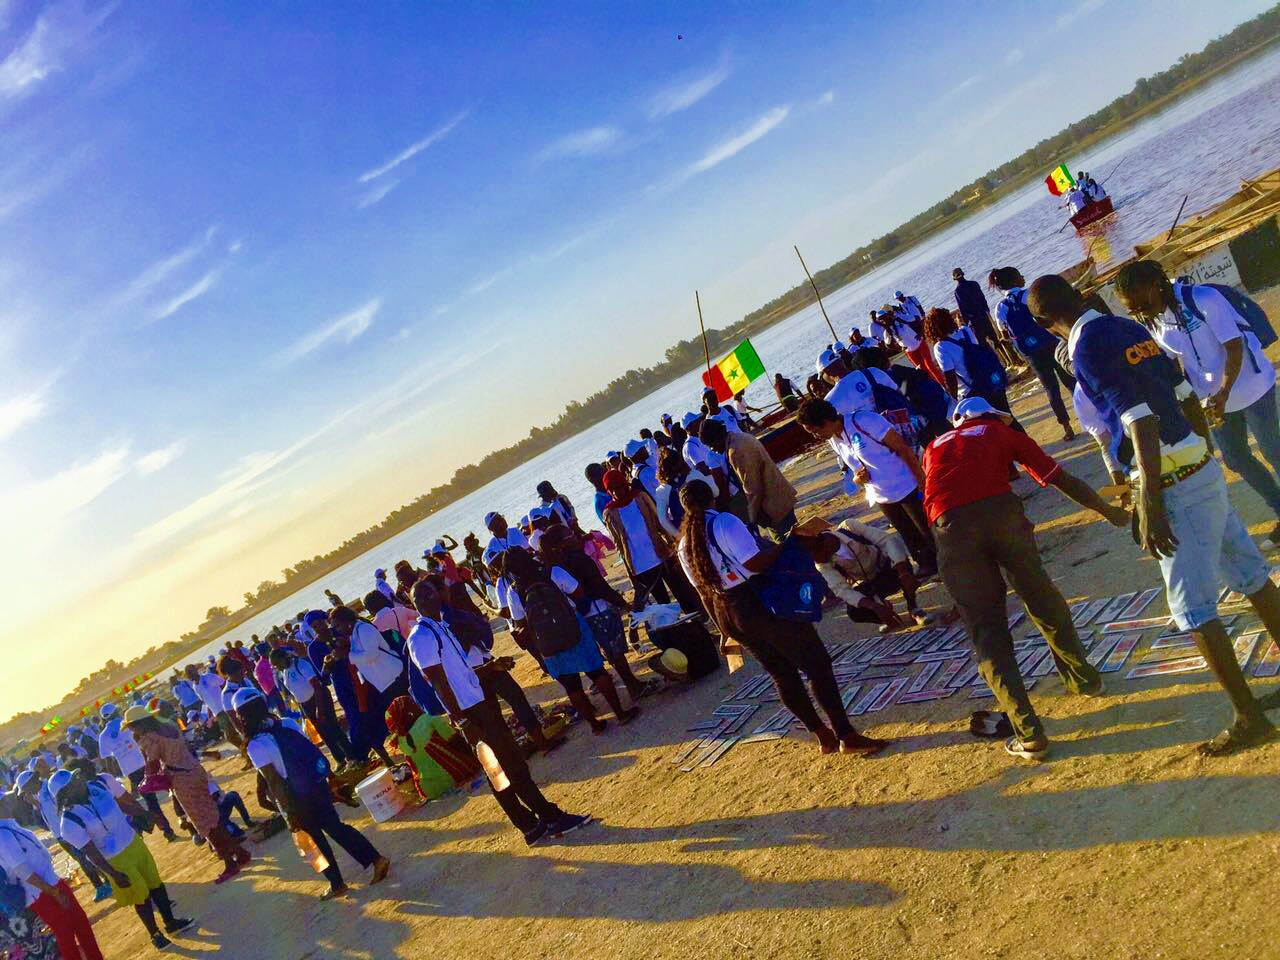 Dakar : zeste de panafricanisme et de leadership